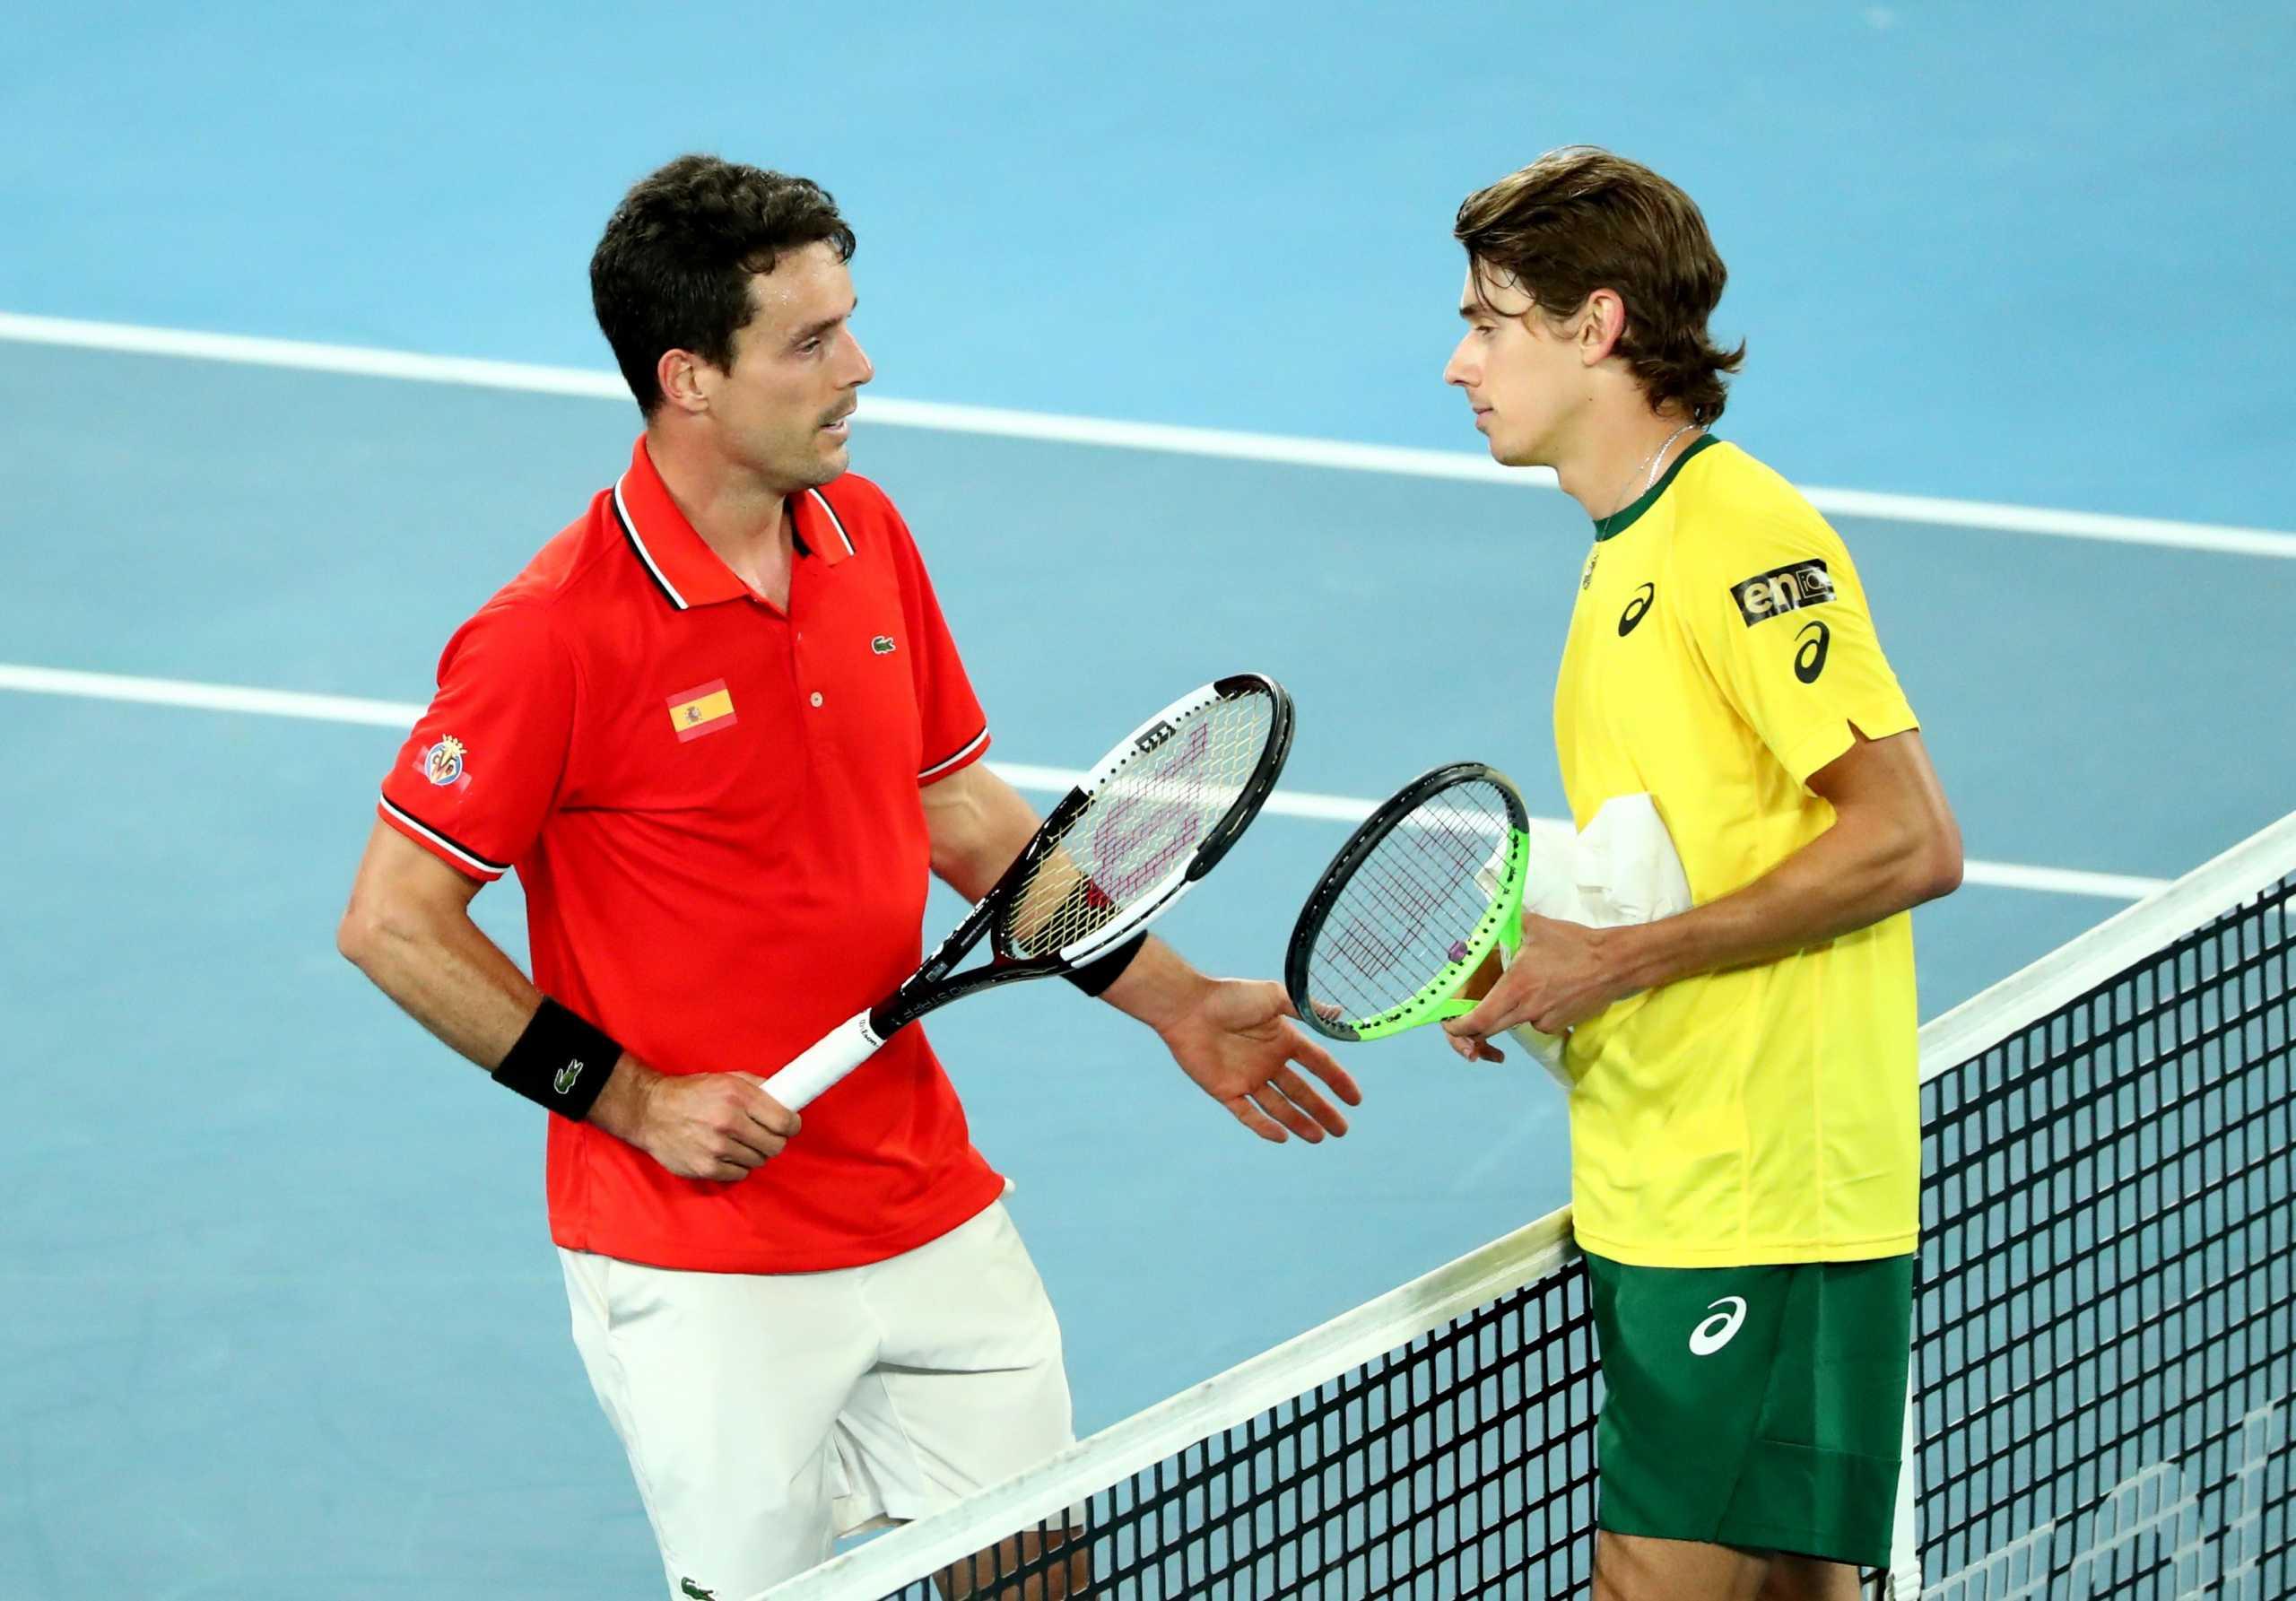 ATP Cup: Η Ισπανία «σκότωσε» την Αυστραλία και περιμένει την Ελλάδα